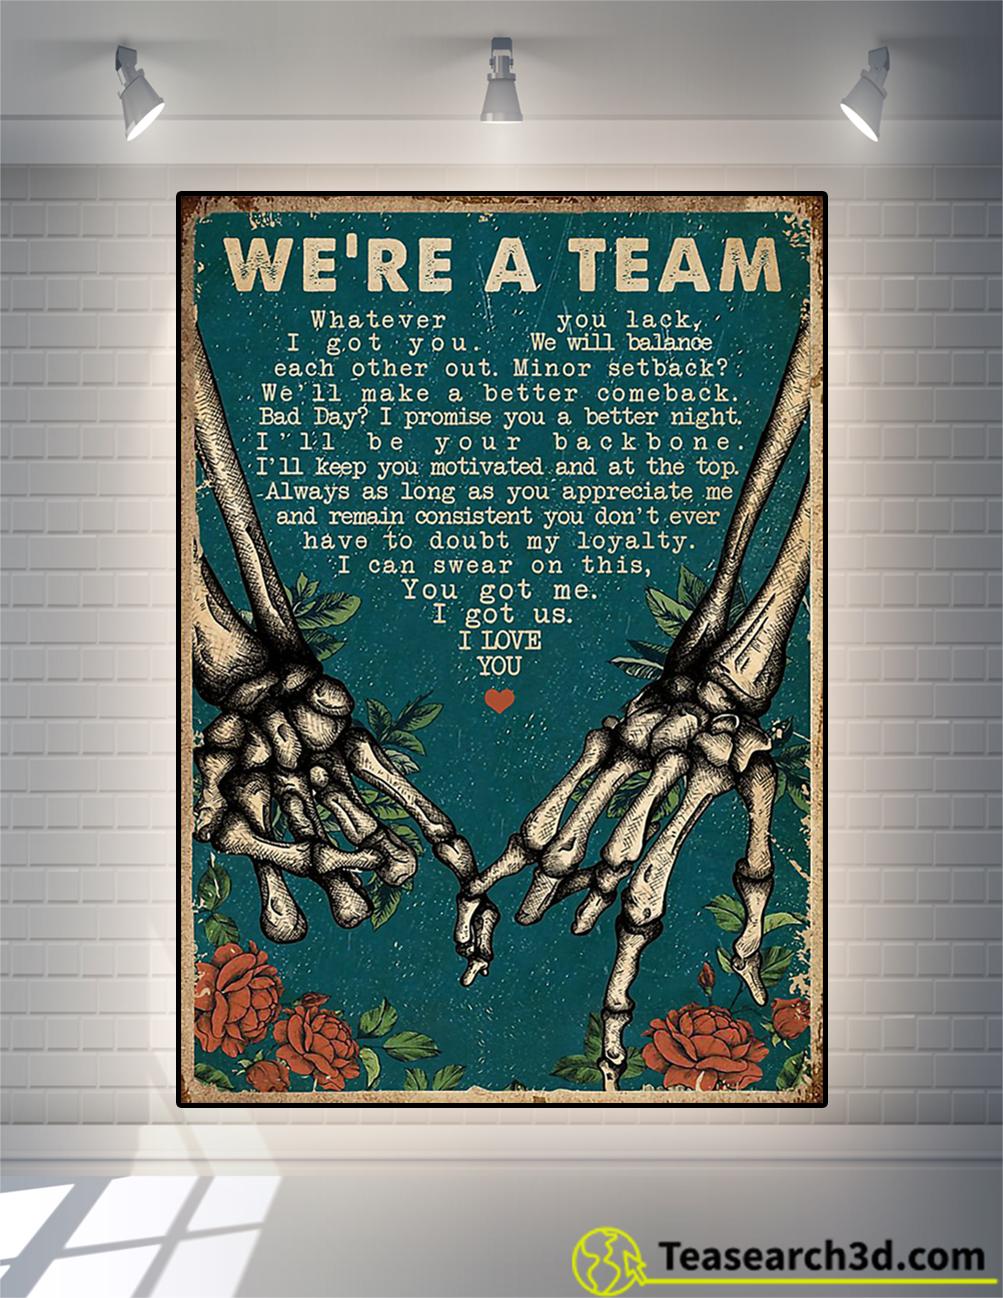 Skeleton retro we're a team poster